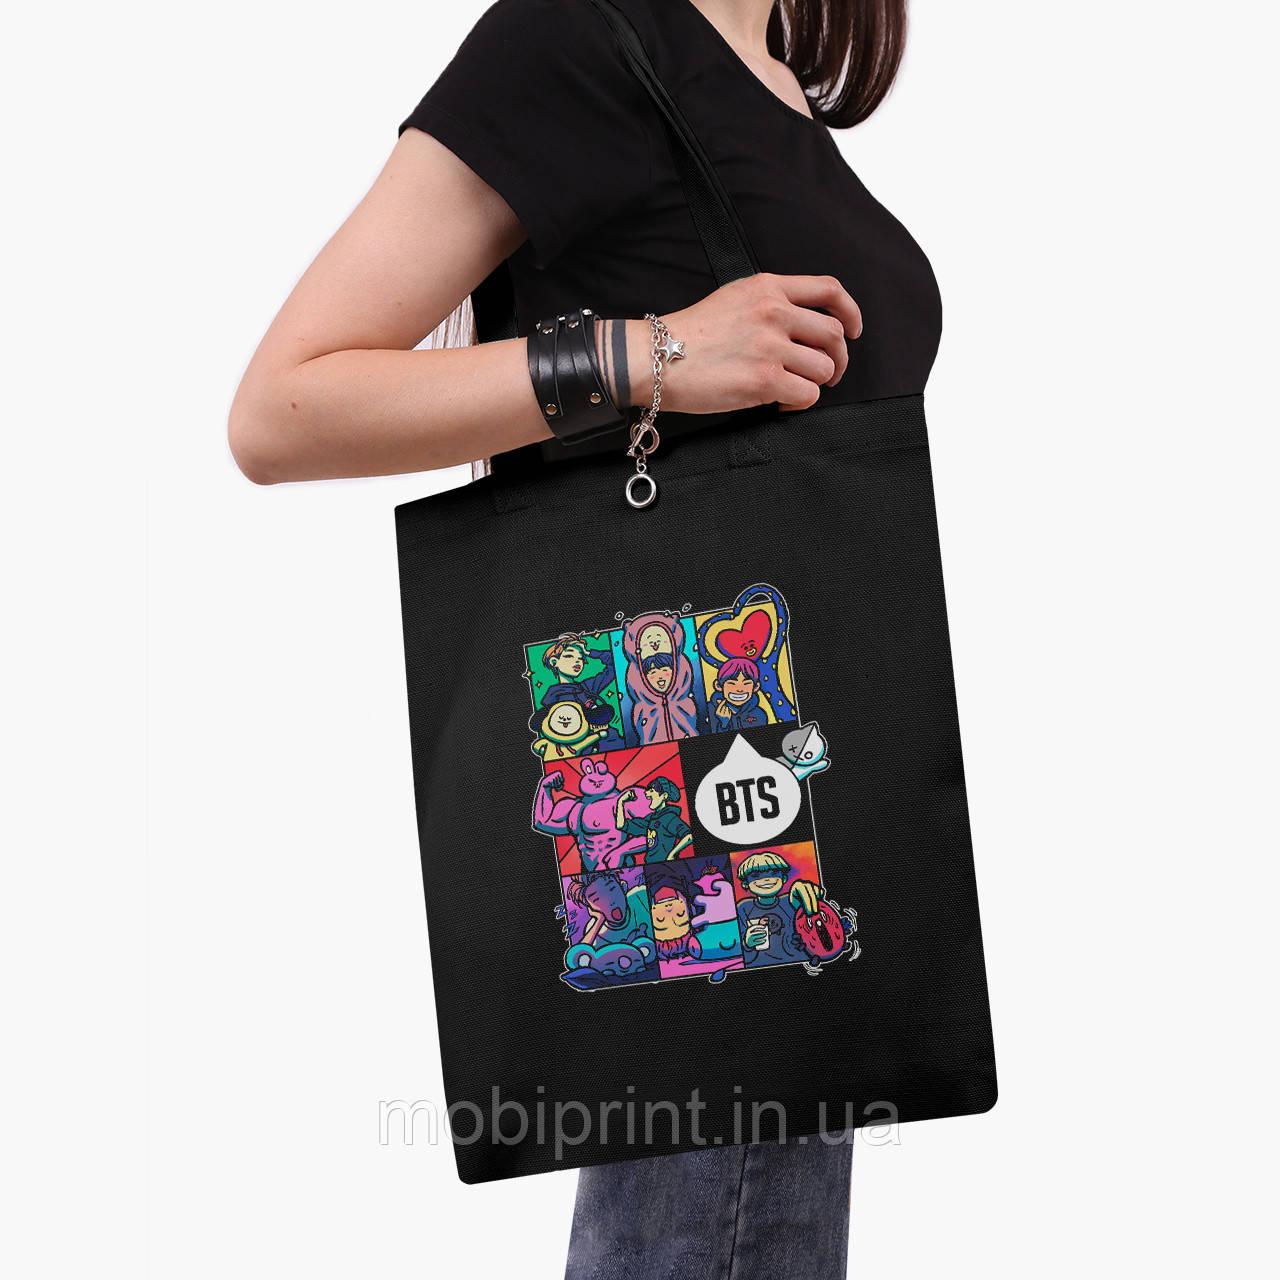 Еко сумка шоппер чорна БТС (BTS) (9227-1078-2) экосумка шопер 41*35 см